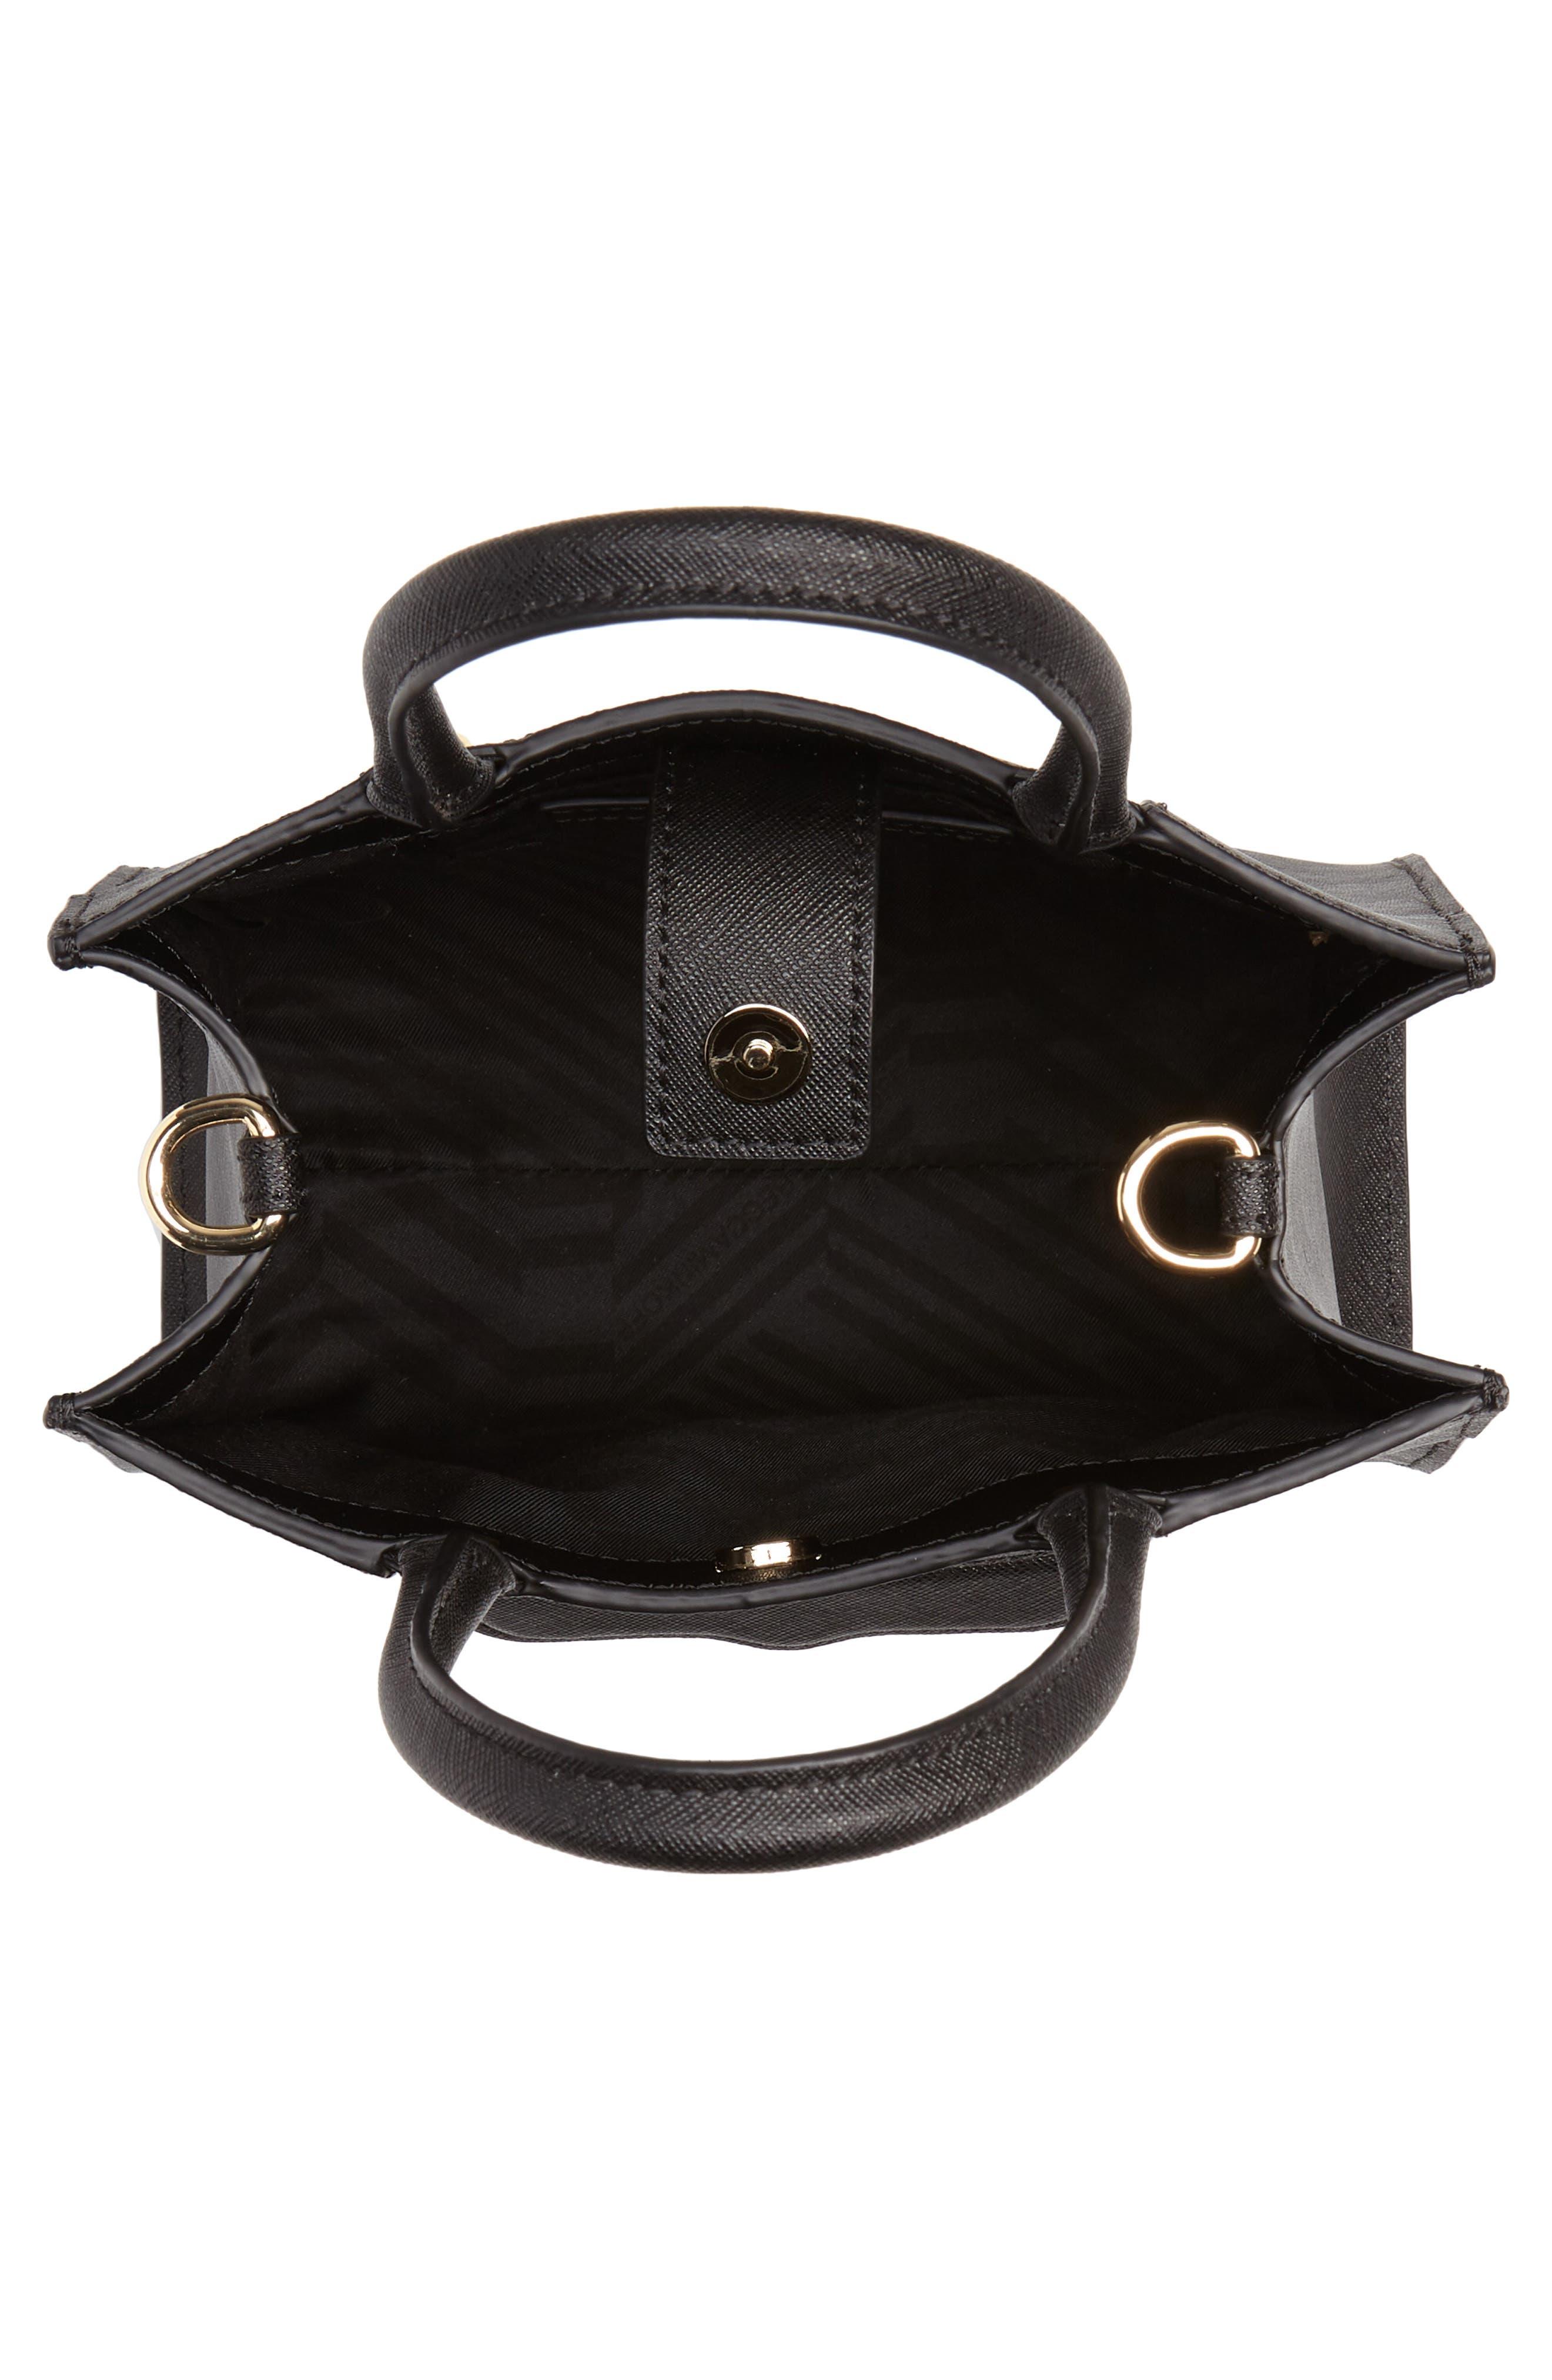 REBECCA MINKOFF, 'Mini MAB Tote' Crossbody Bag, Alternate thumbnail 4, color, 005